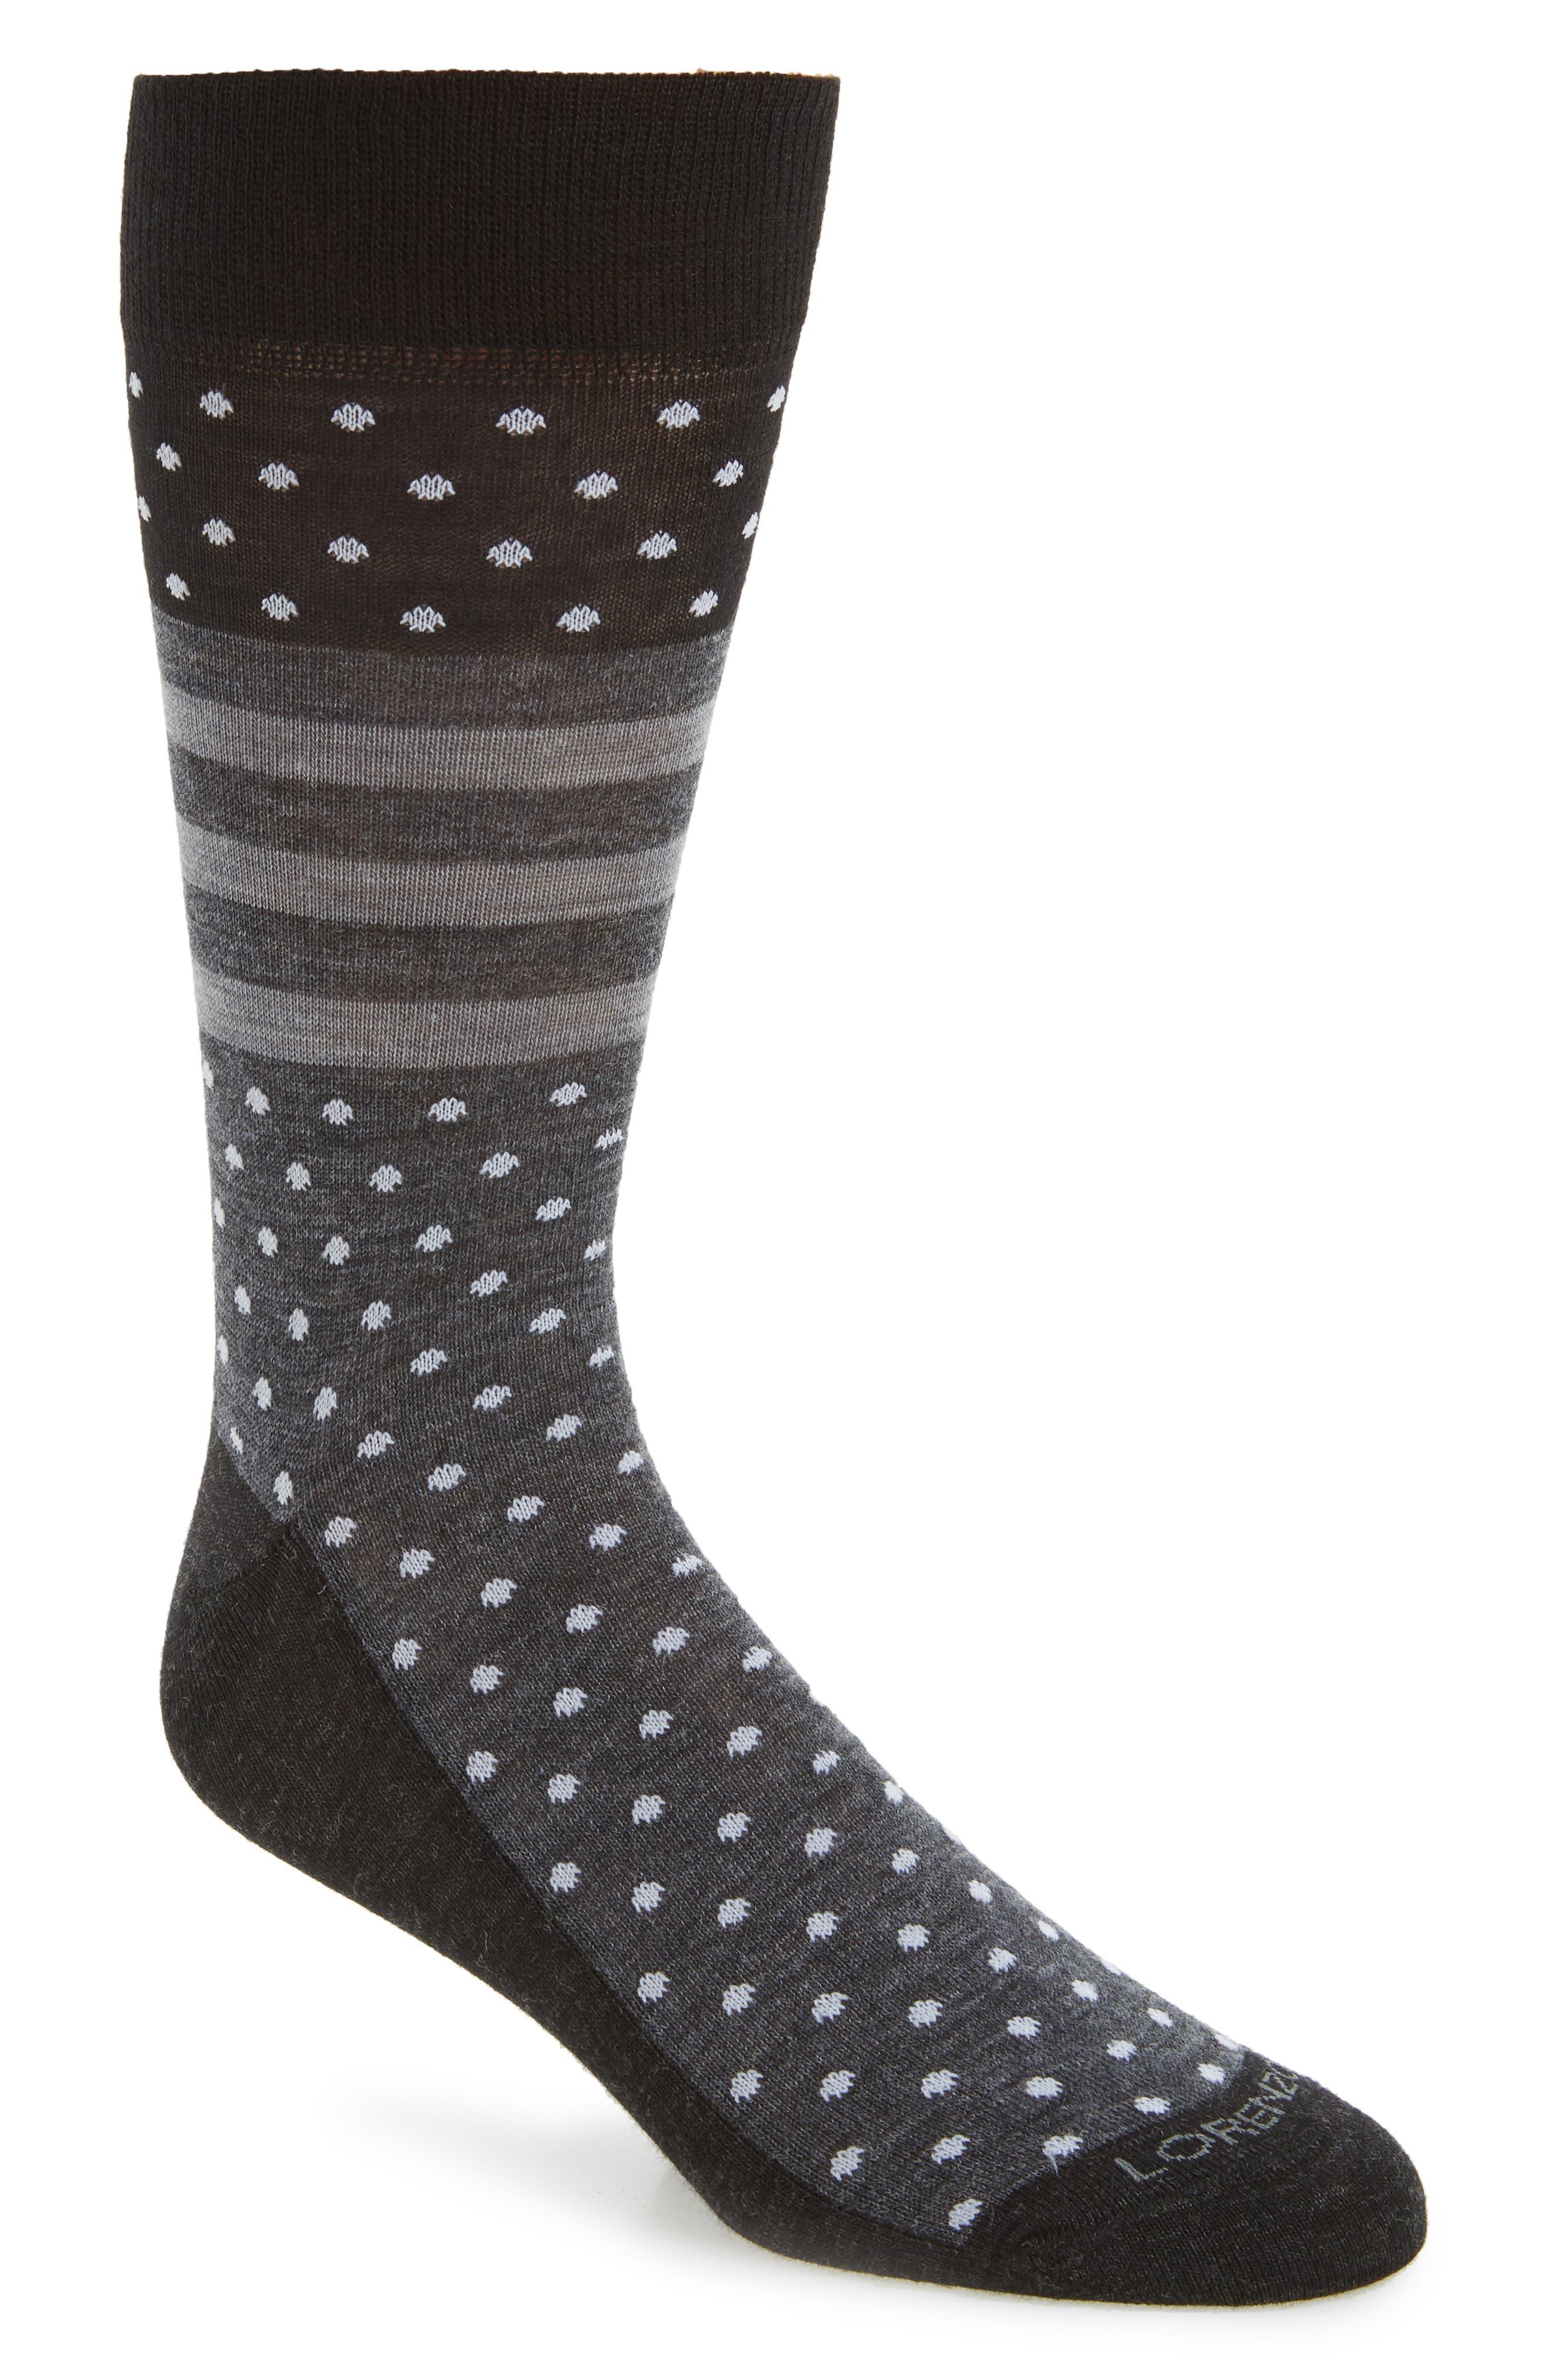 Lorenzo Uomo Winter Dot Stripe Socks